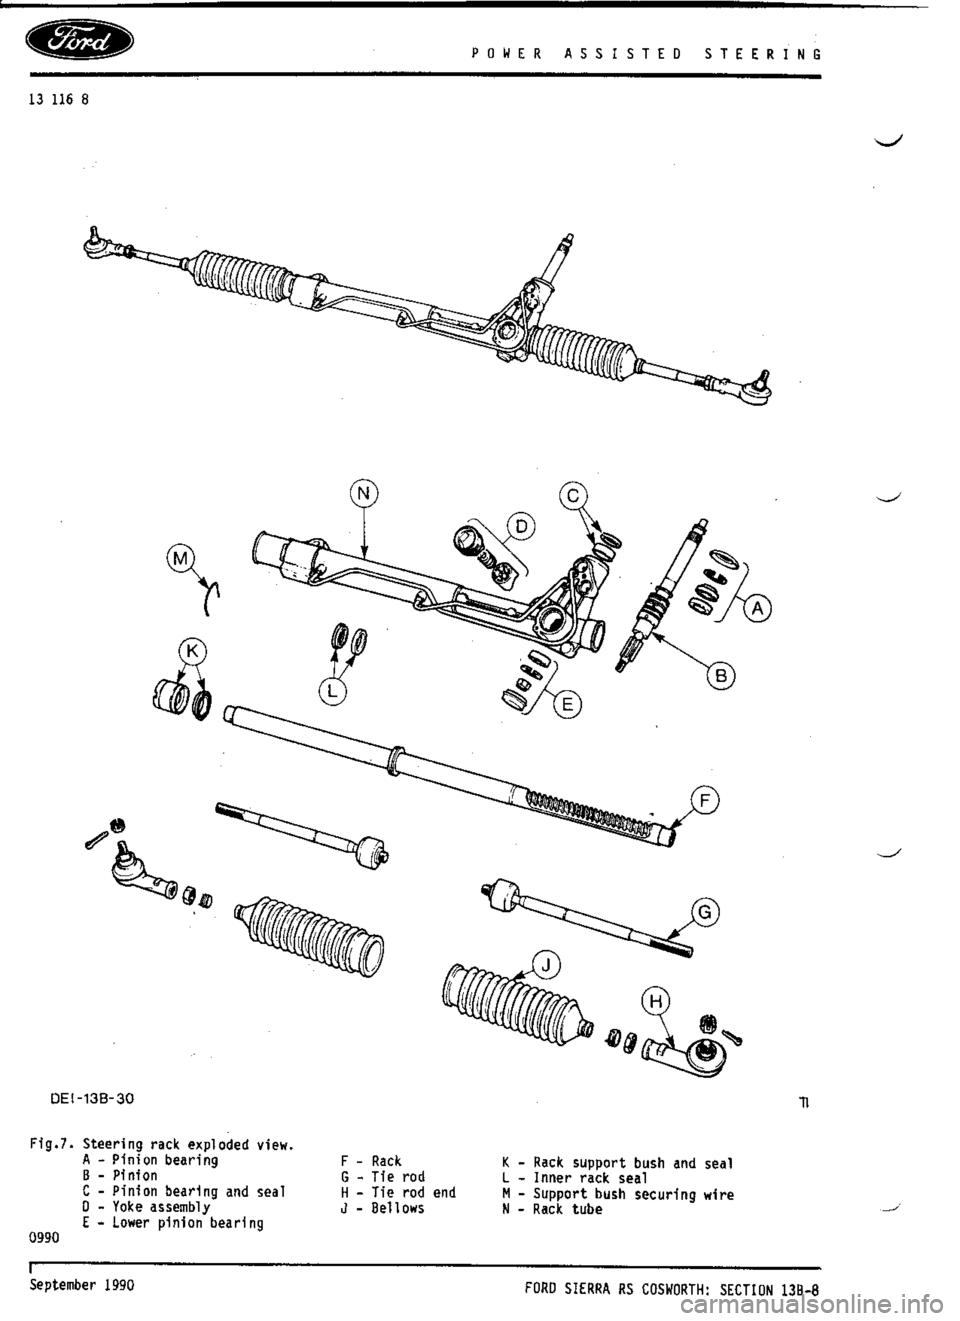 FORD SIERRA RS COSWORTH 1988 1.G Workshop Manual (993